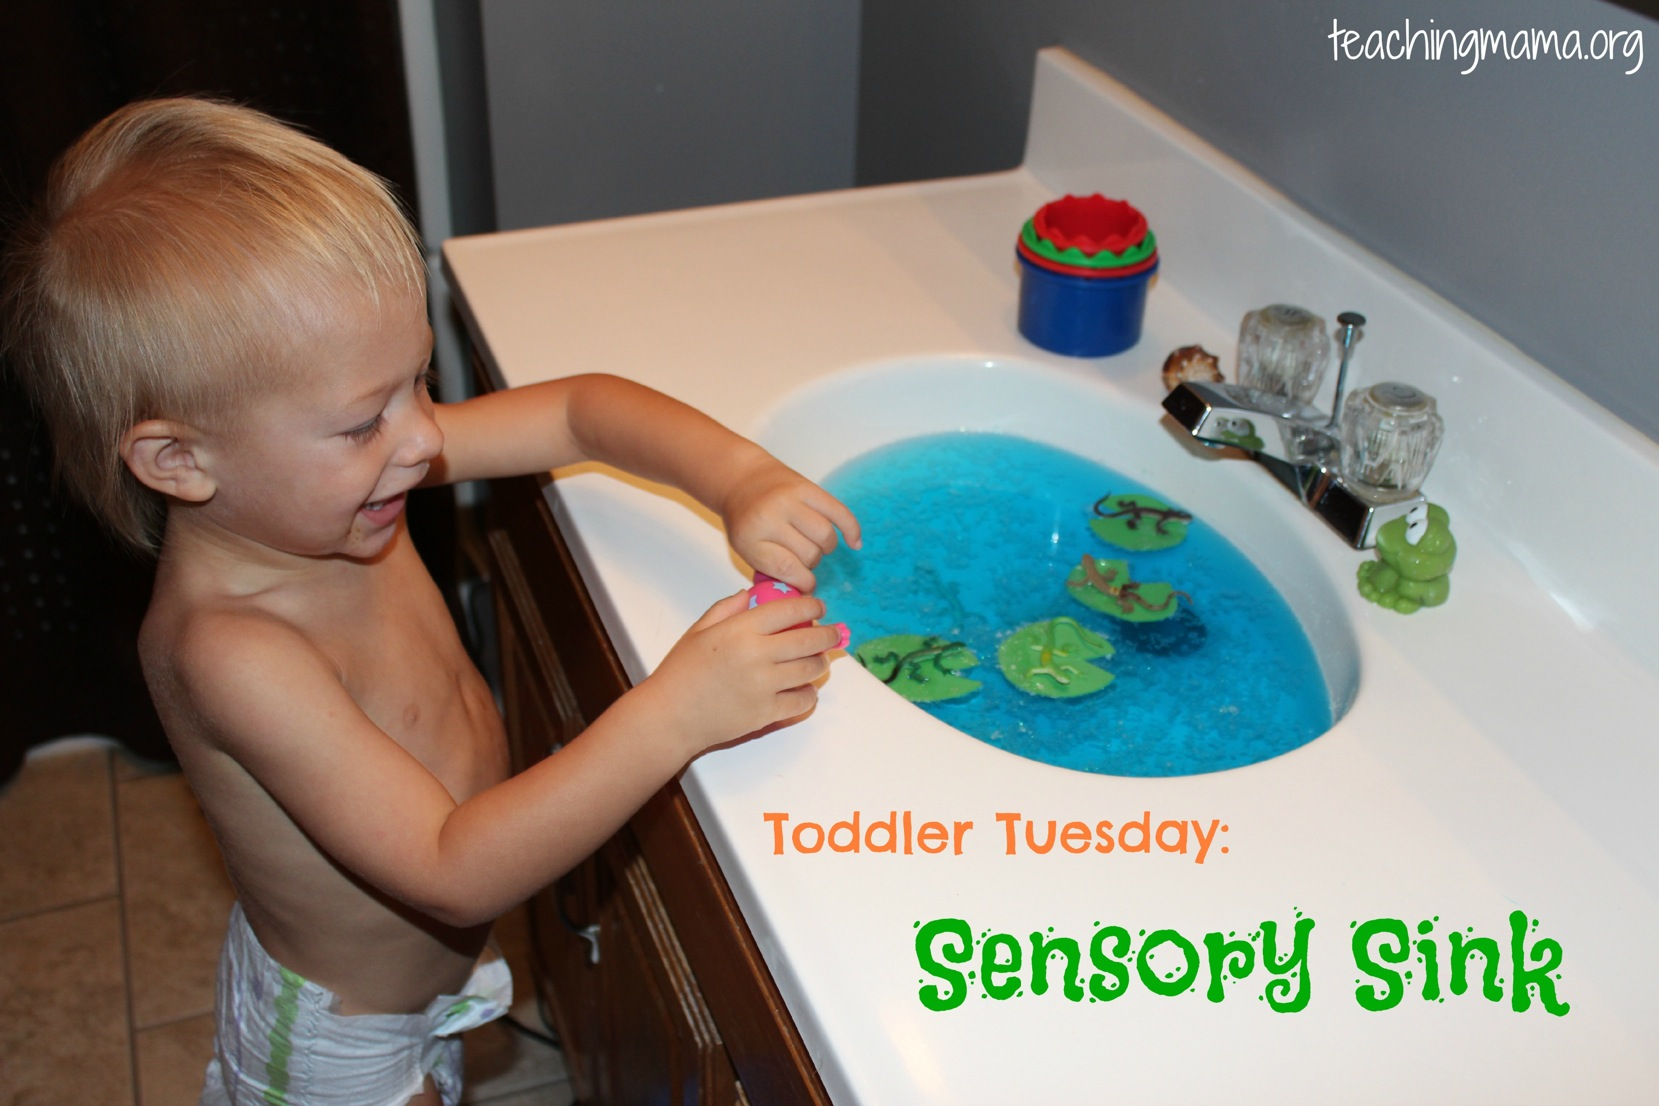 sensory sink